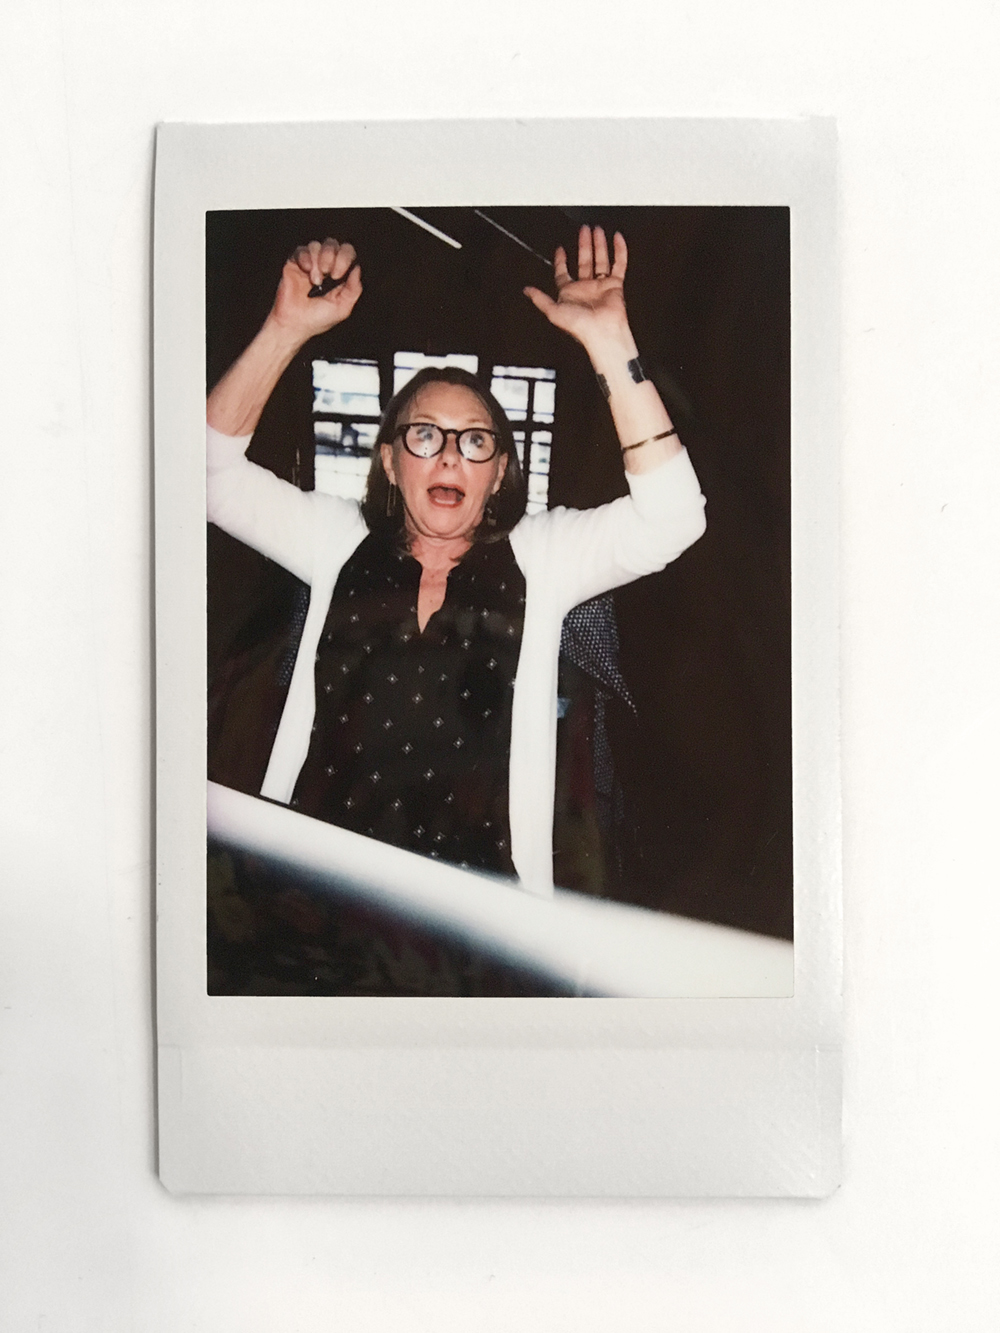 <b>Judy Rush</b><br /><i>Partner, Founder of Realfake</i>